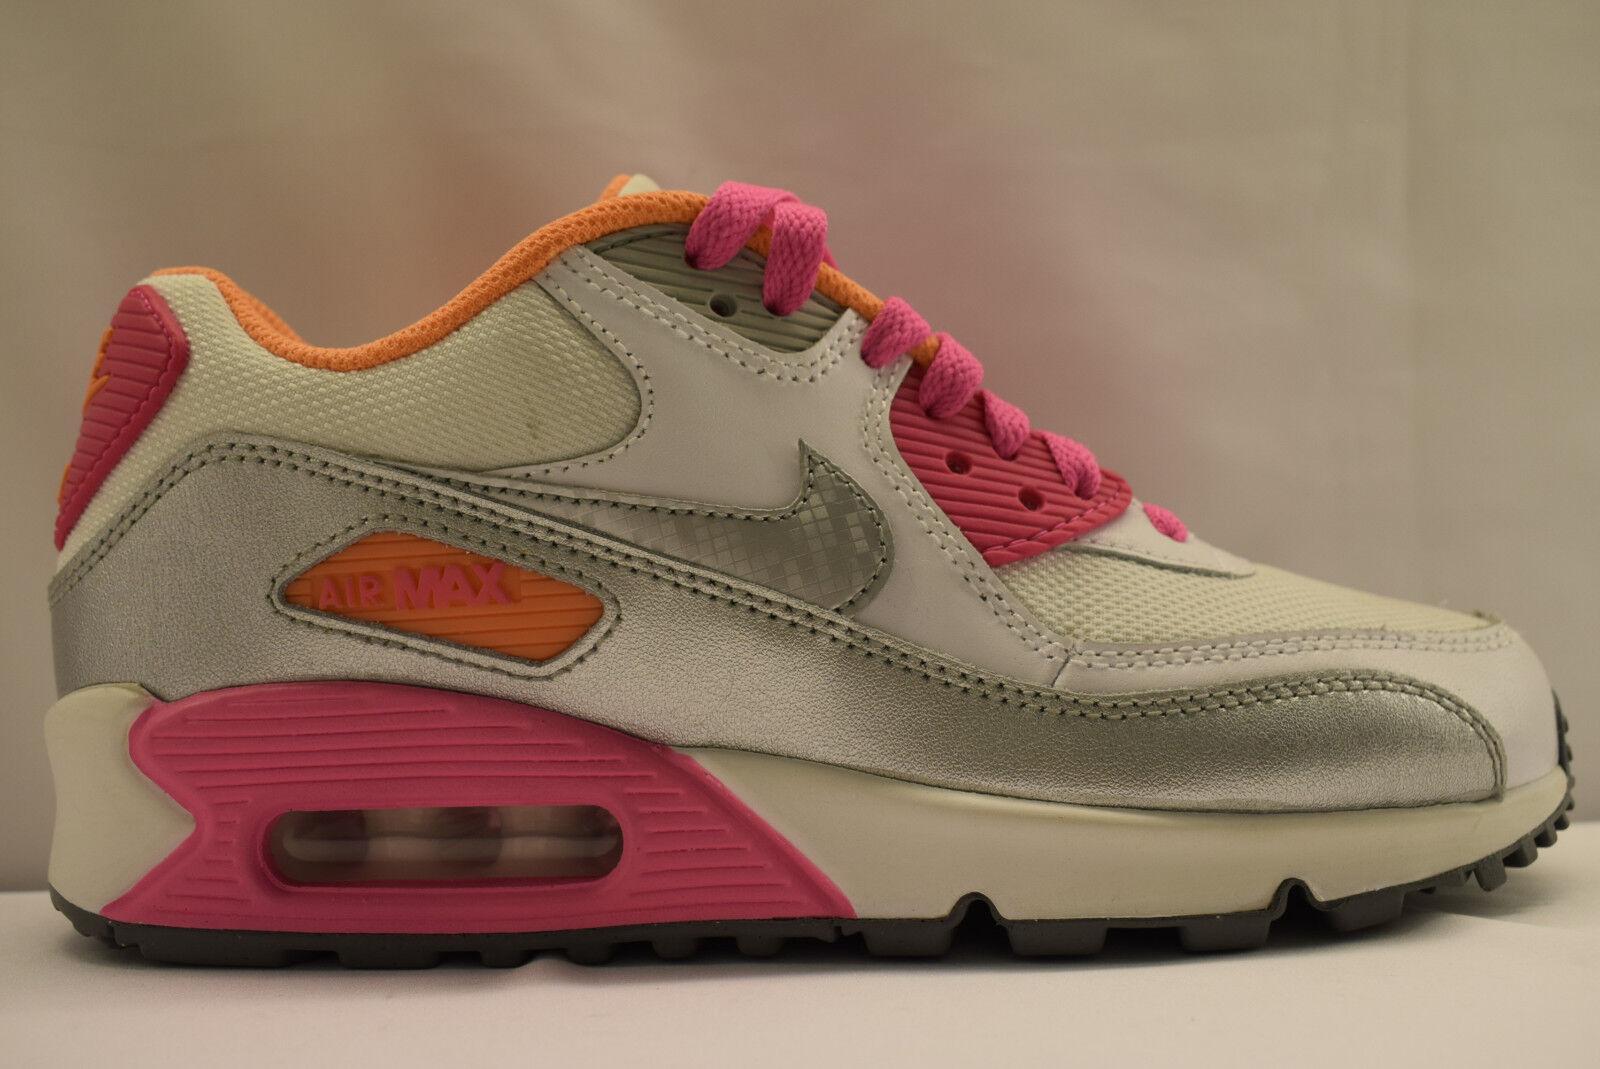 NIKE AIR MAX 90 724855 101 Sneaker Damenschuhe